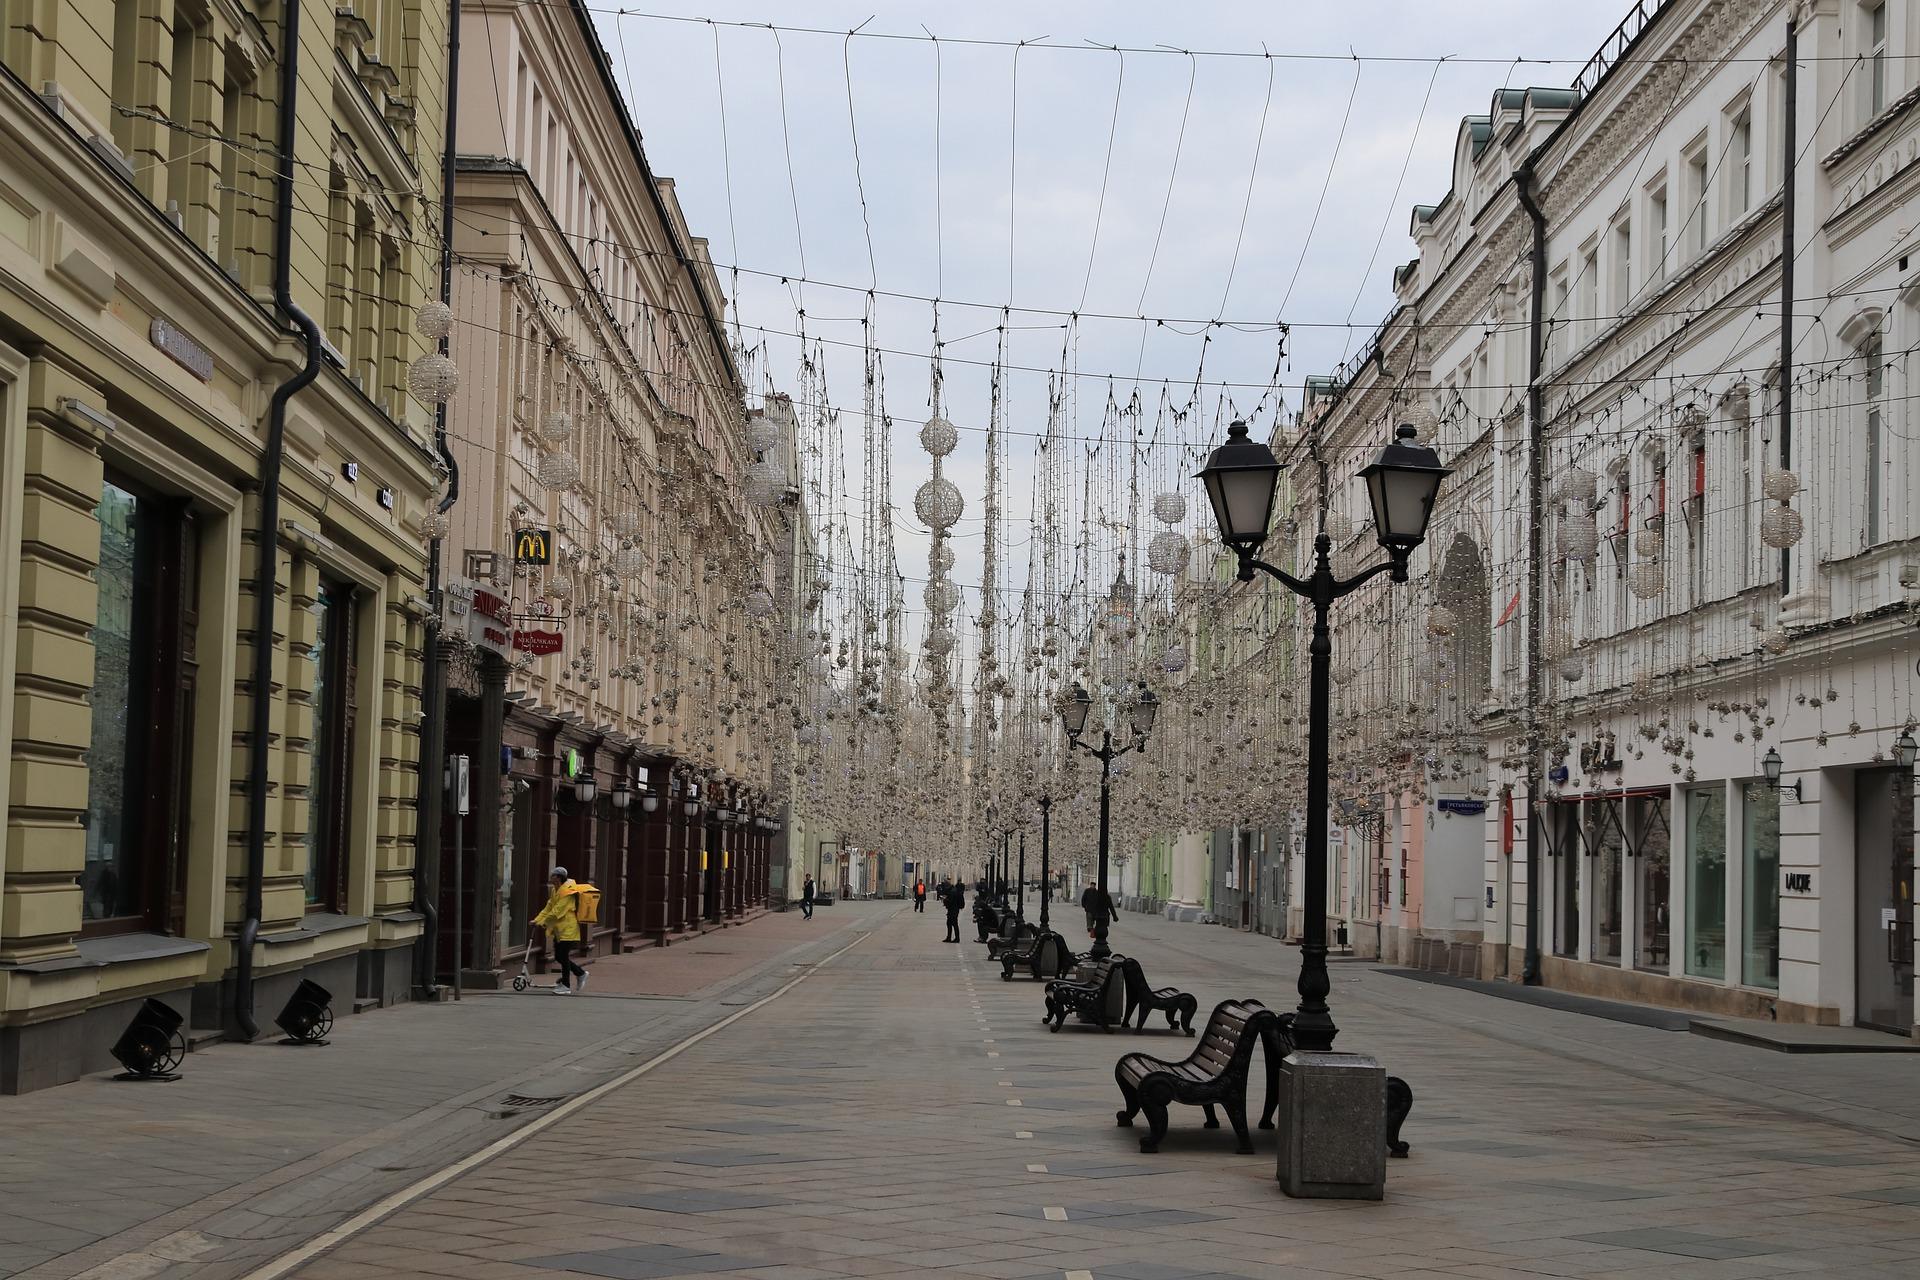 Russia becoming a new COVID-19 hotspot